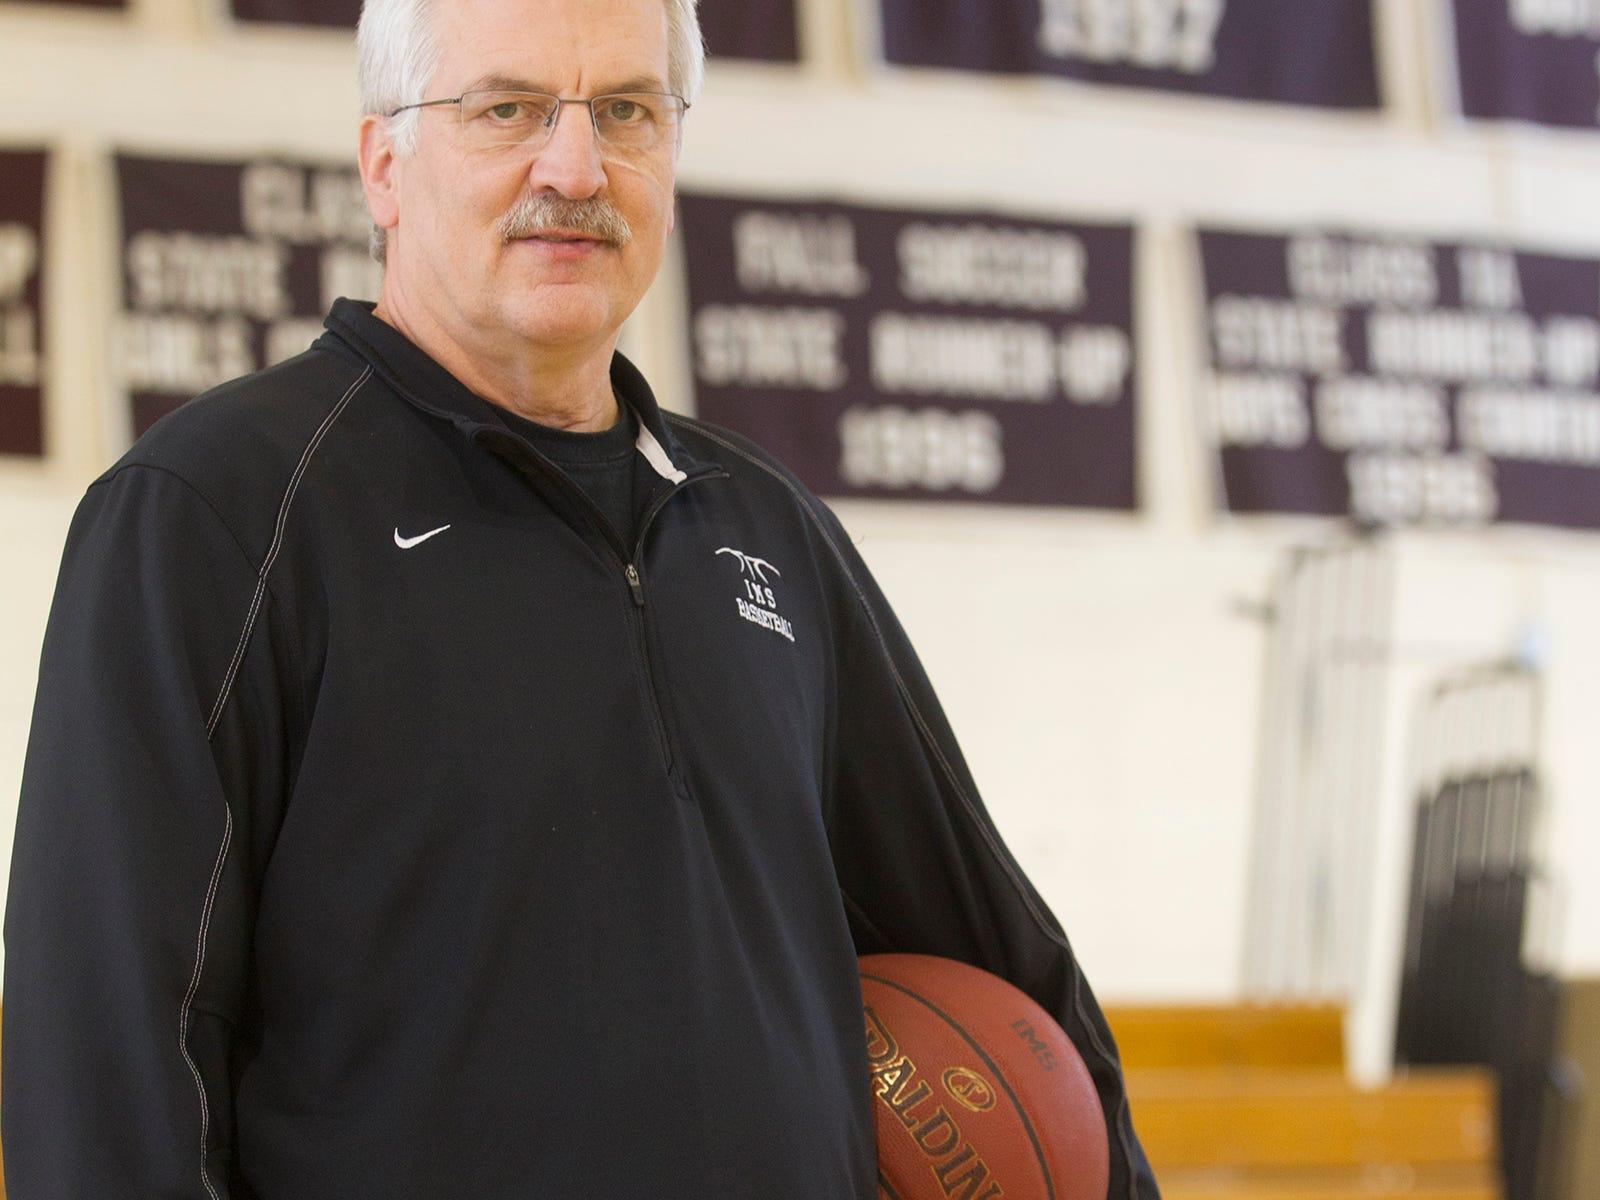 Iowa Mennonite School head coach Dwight Gingerich has won 608 games entering Thursday's Class 1A District opener.